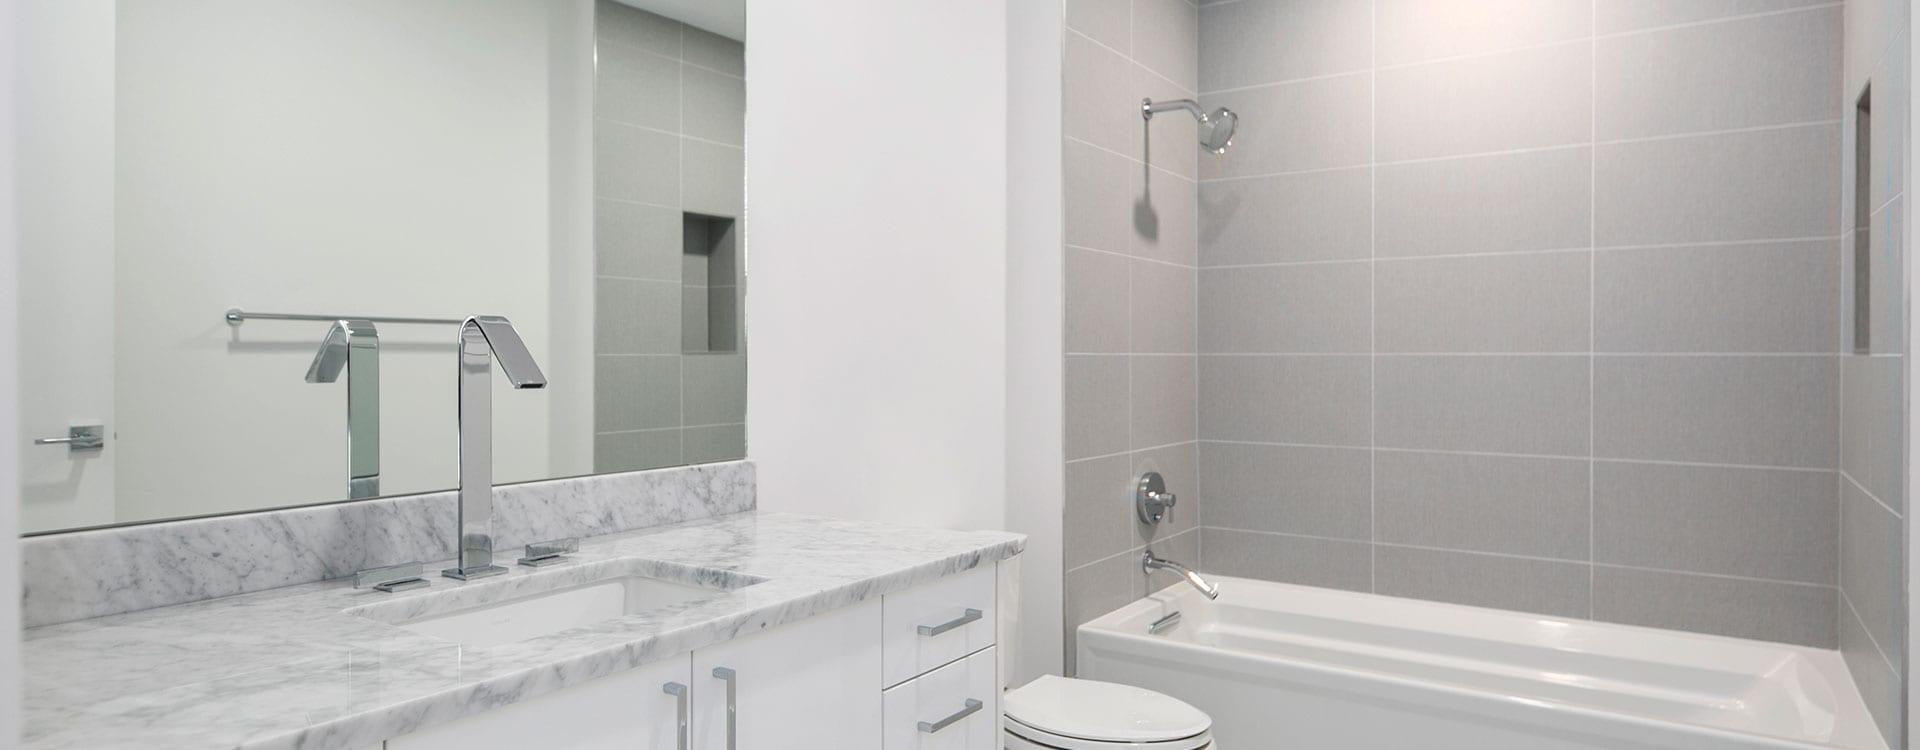 blvd sarasota residence 1503 bathroom